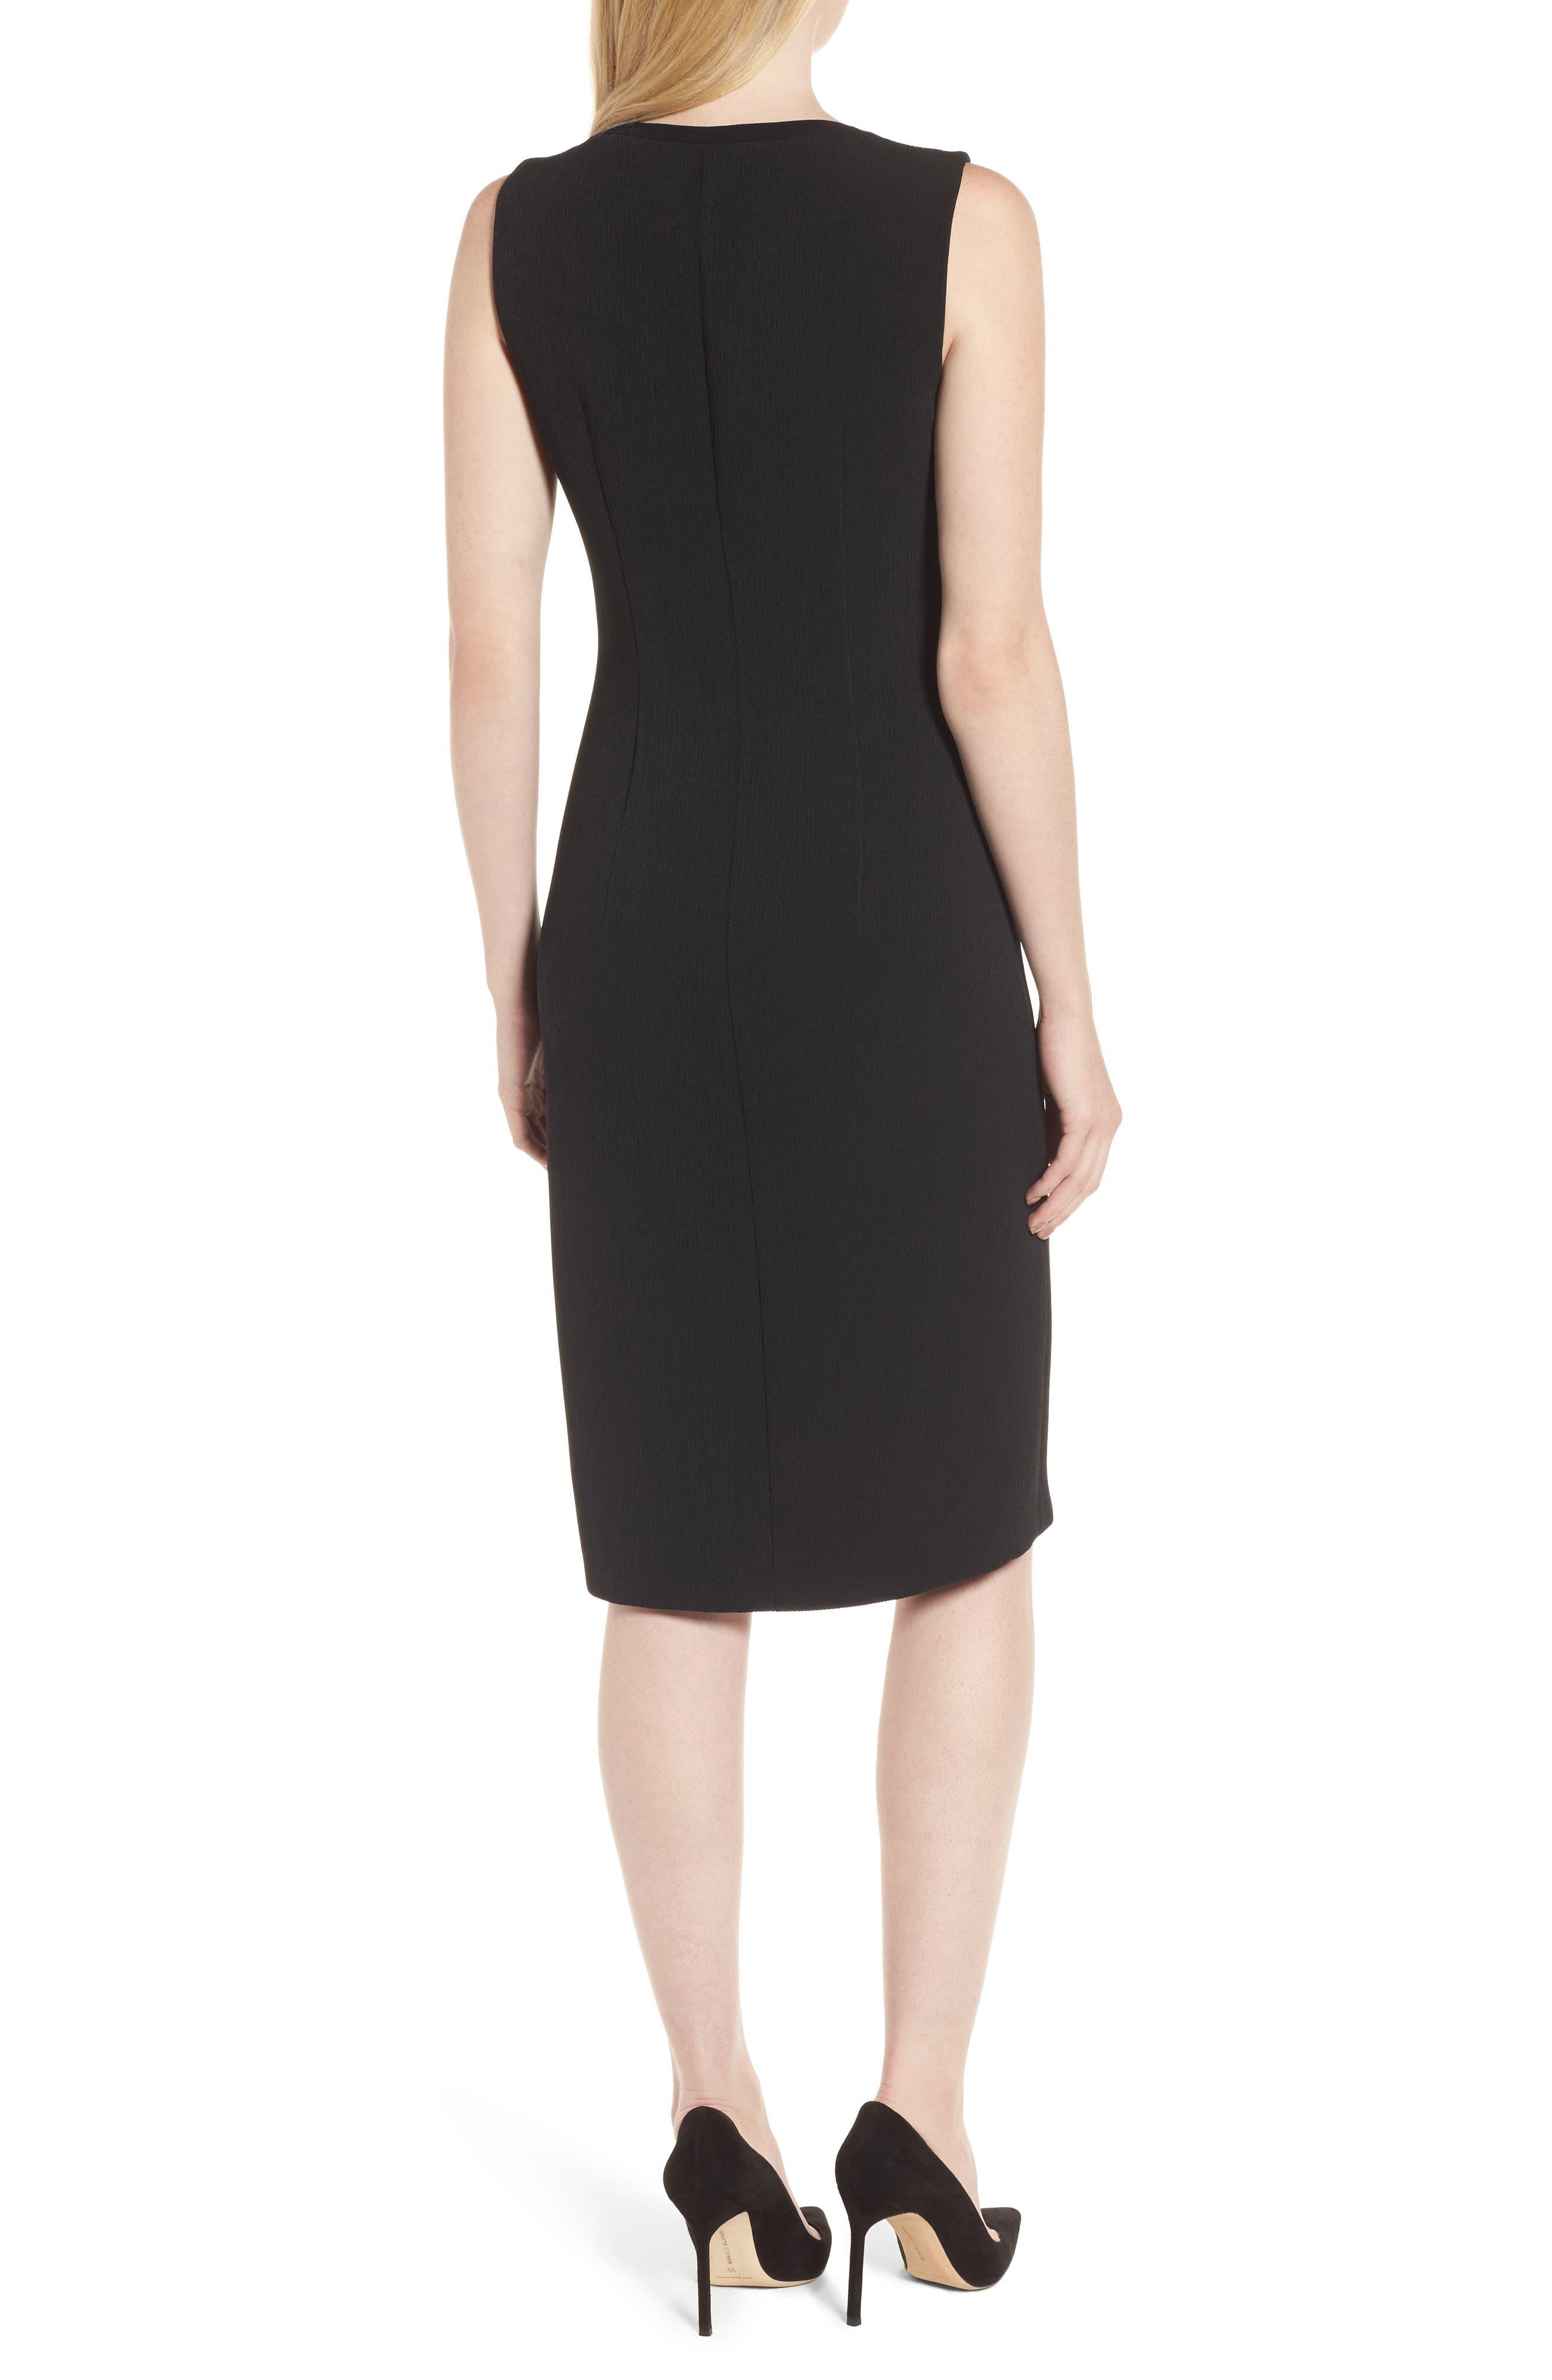 Danafea Dress,                             Alternate thumbnail 2, color,                             001